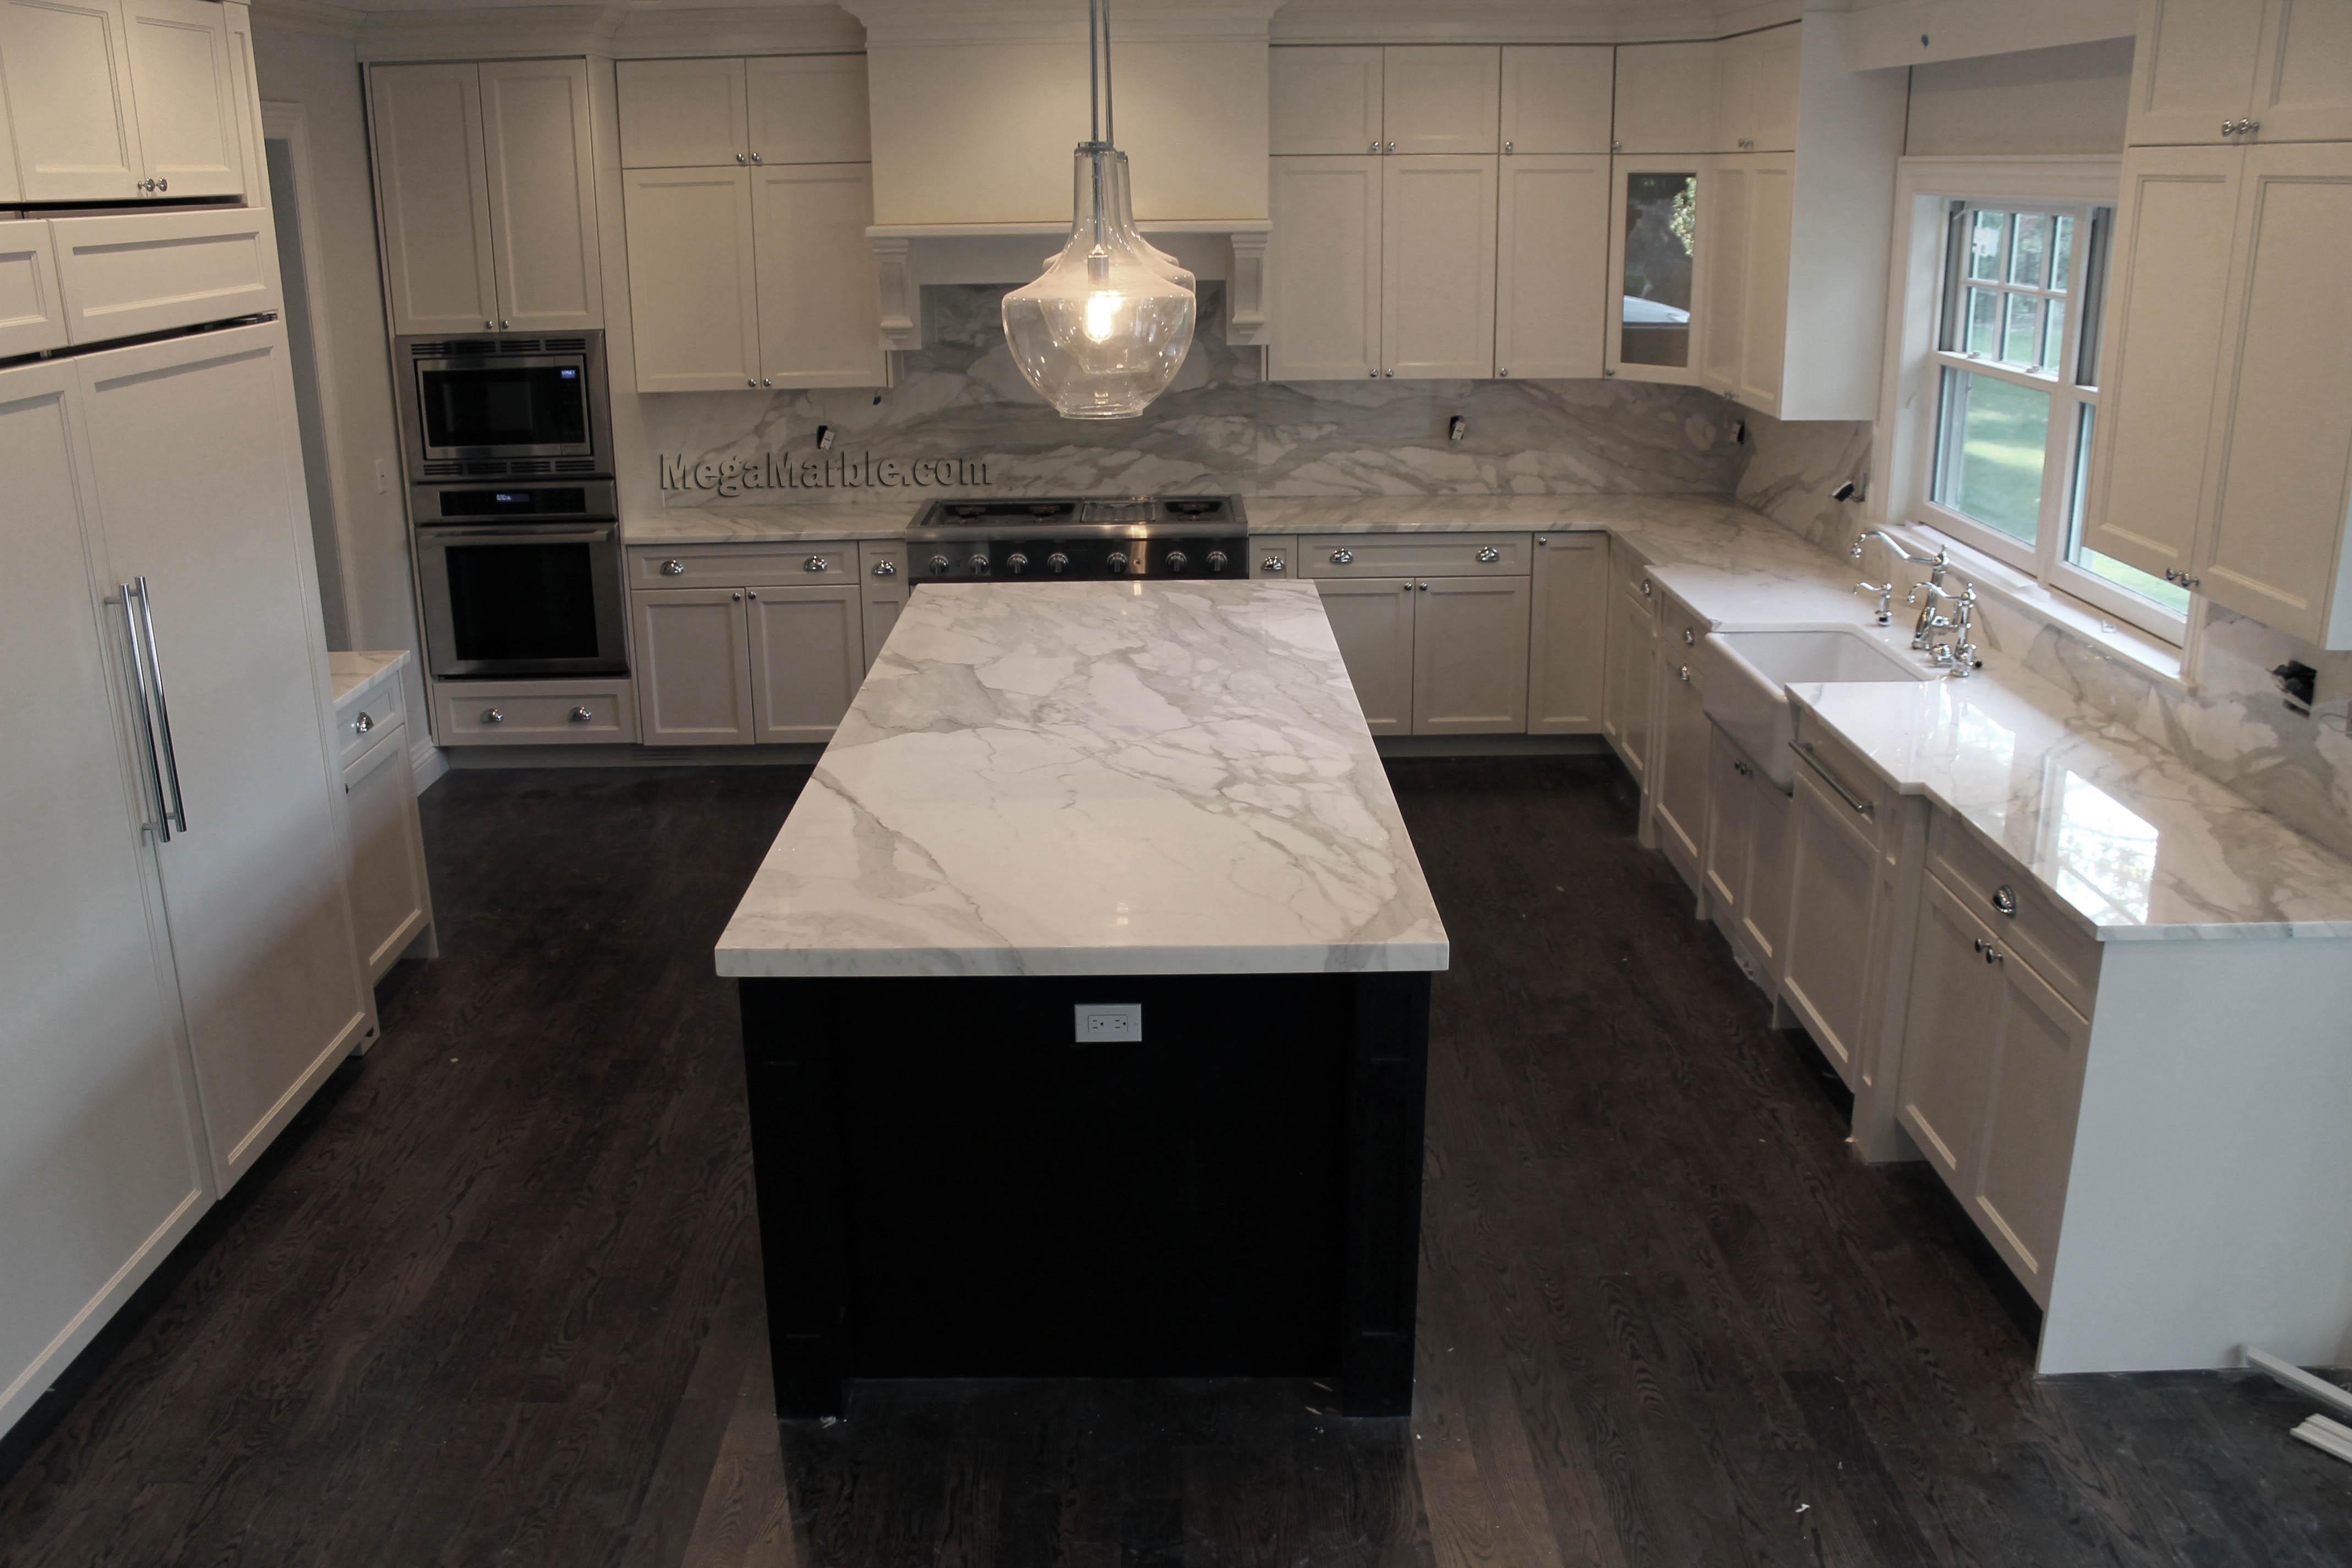 me kitchen natural granite countertop near manufactured quartz photos countertops tan brown stone marble new